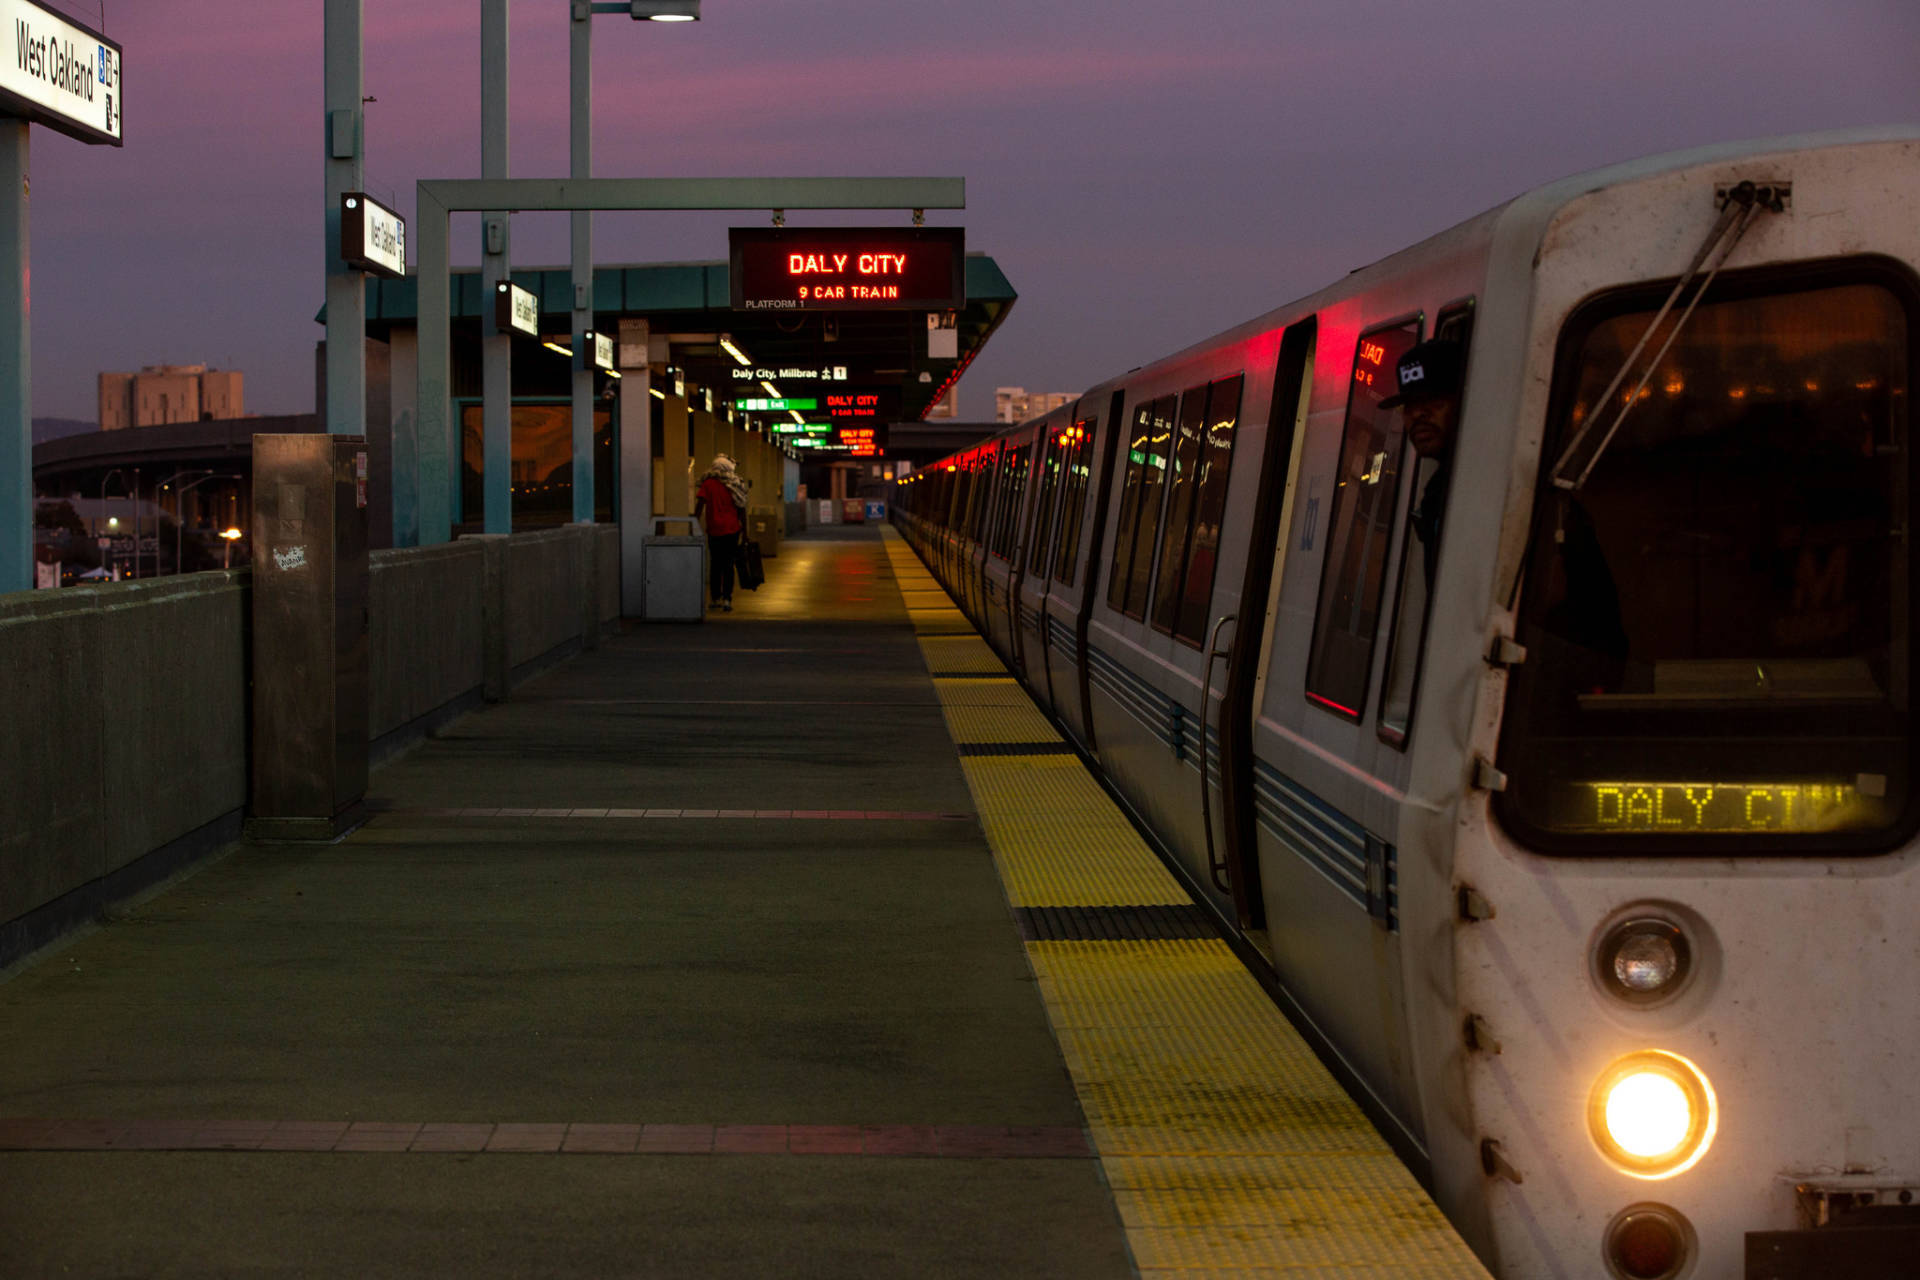 A San Francisco-bound BART train at West Oakland Station.  Dan Brekke/KQED